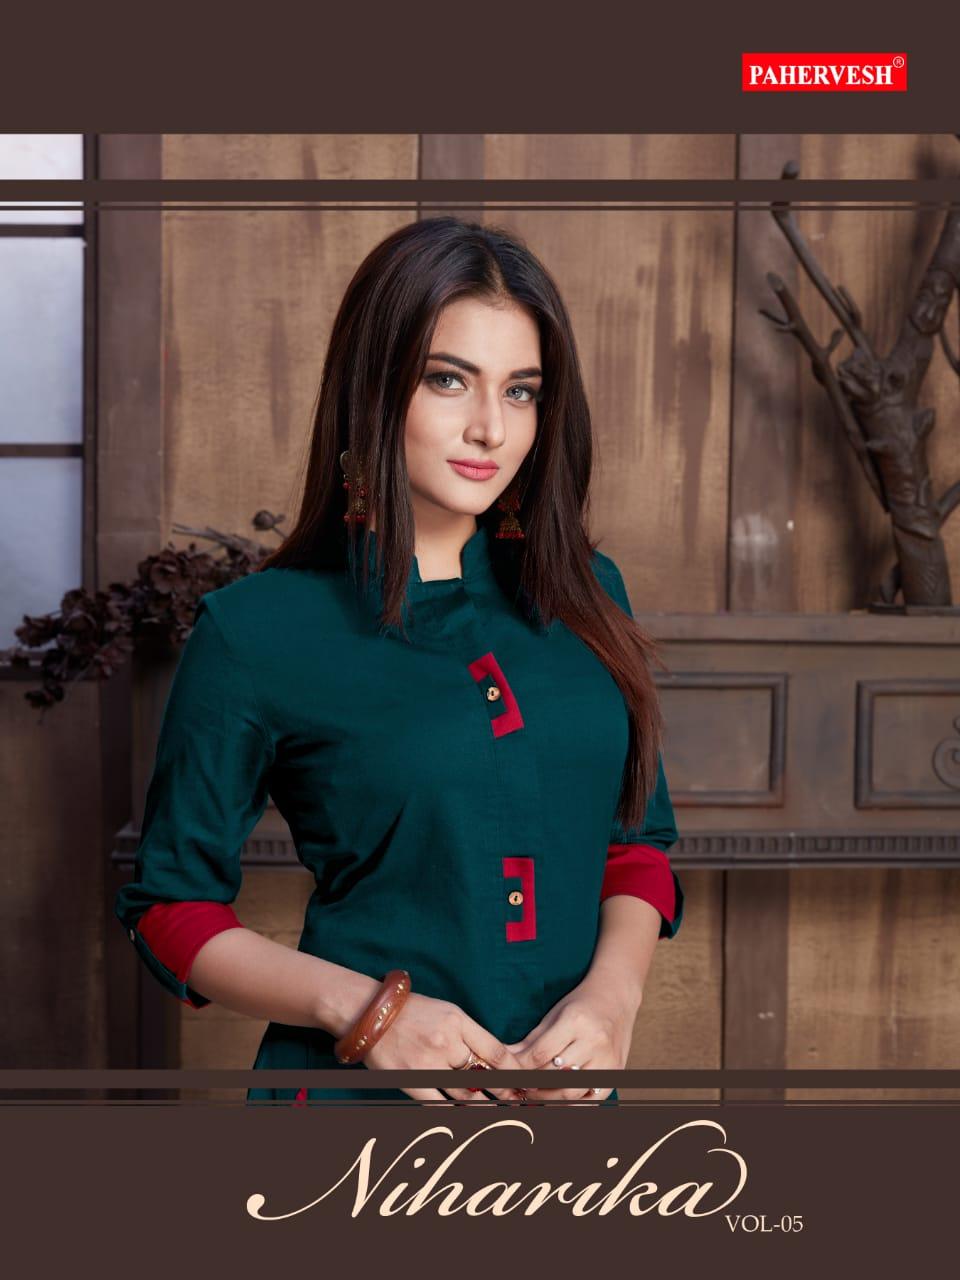 Pahervesh Niharika Vol 5 Designer Cotton Flax & Embroidered Suits Wholesale